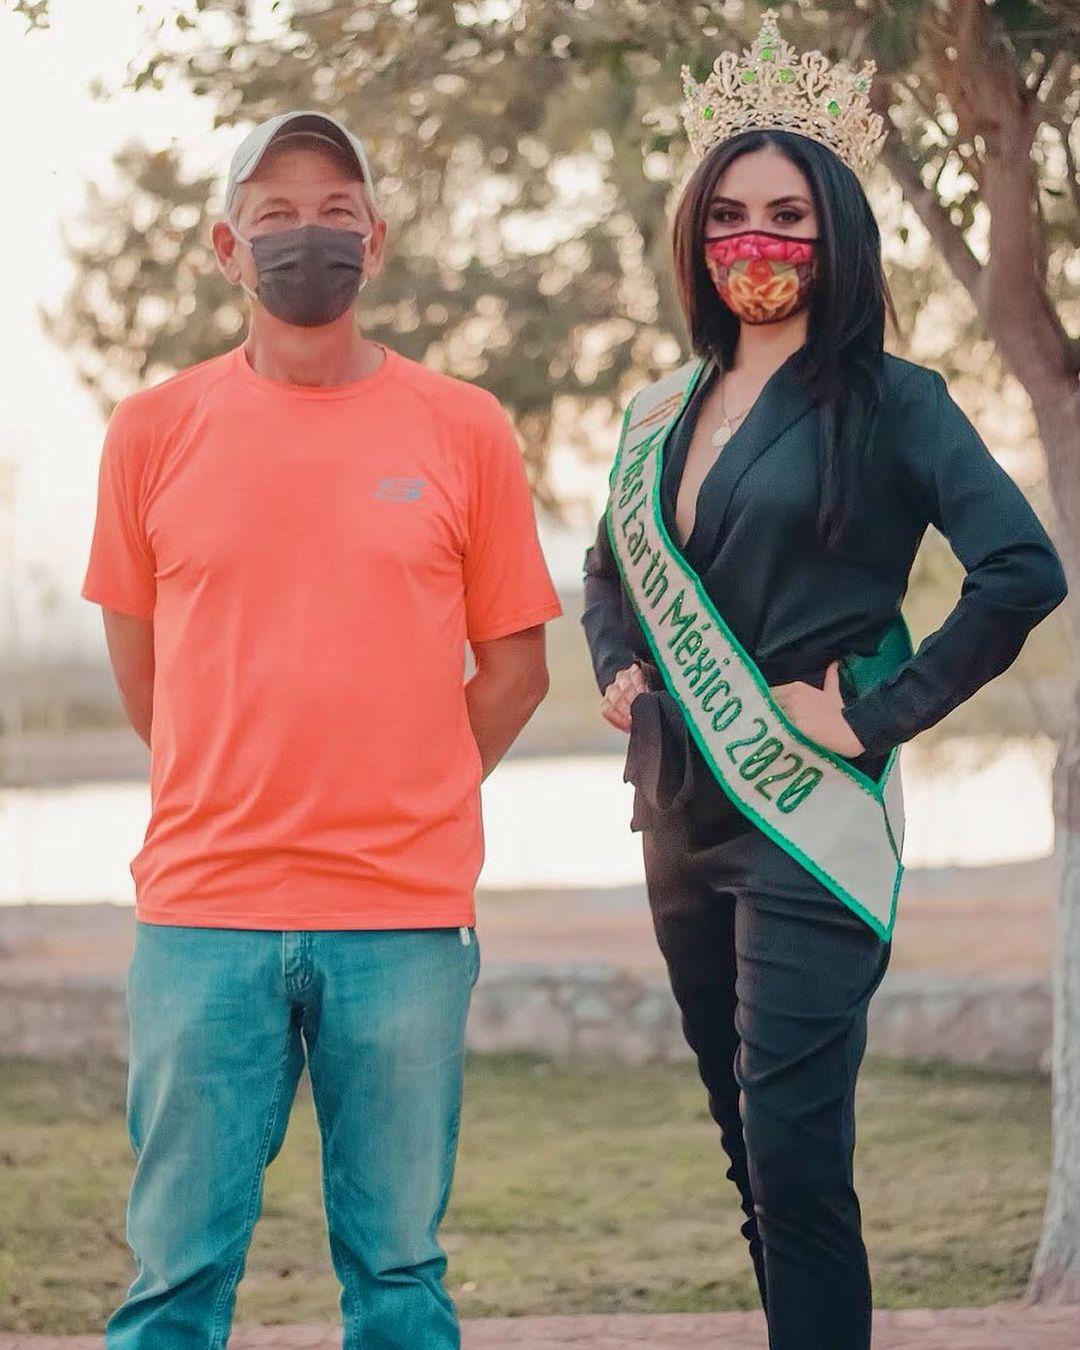 graciela ballesteros, miss earth mexico 2020/top 10 de miss polo international 2019. - Página 3 Gracie38